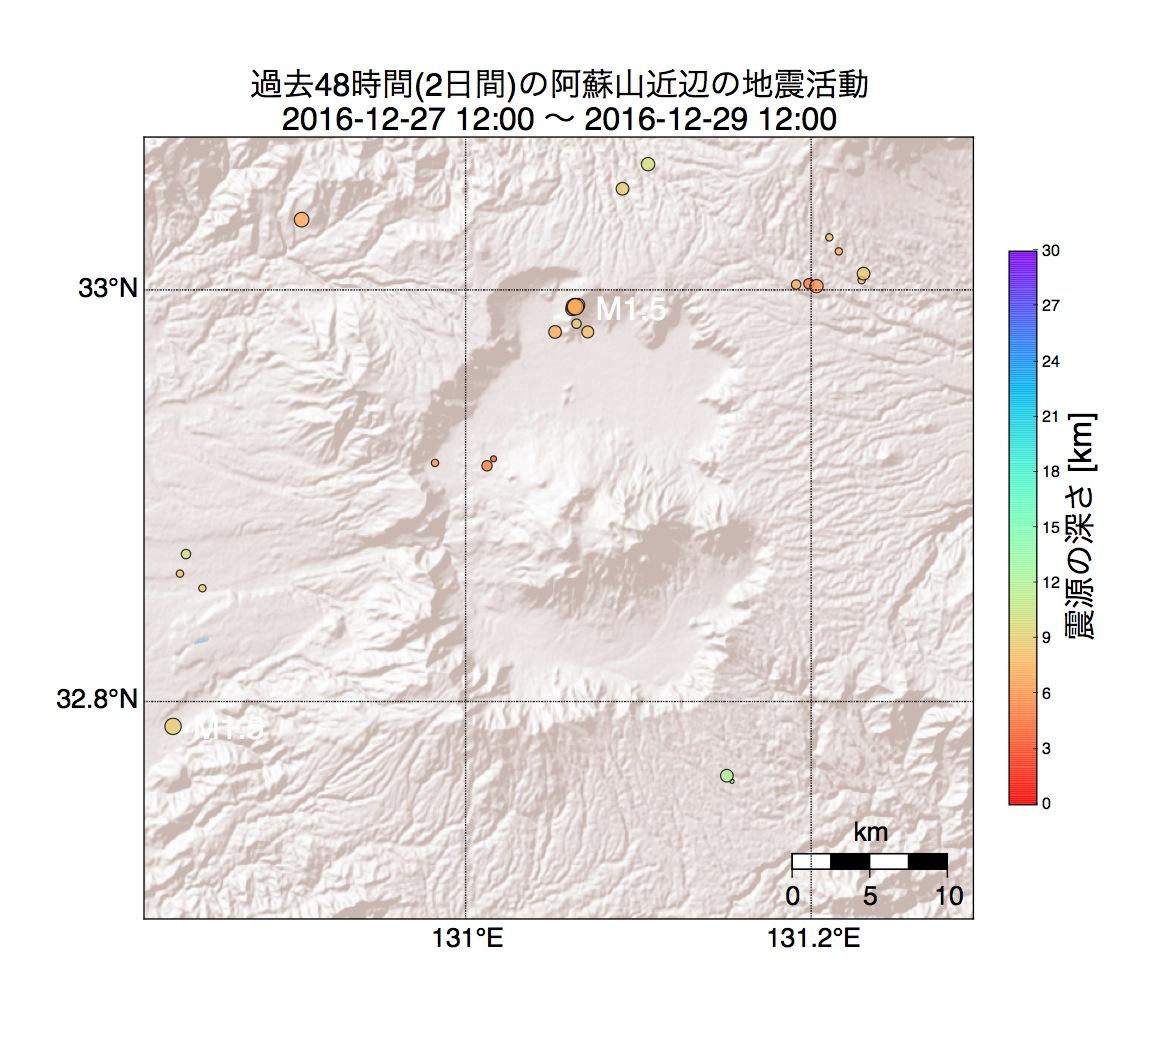 http://jishin.chamu.org/aso/20161229_1.jpg